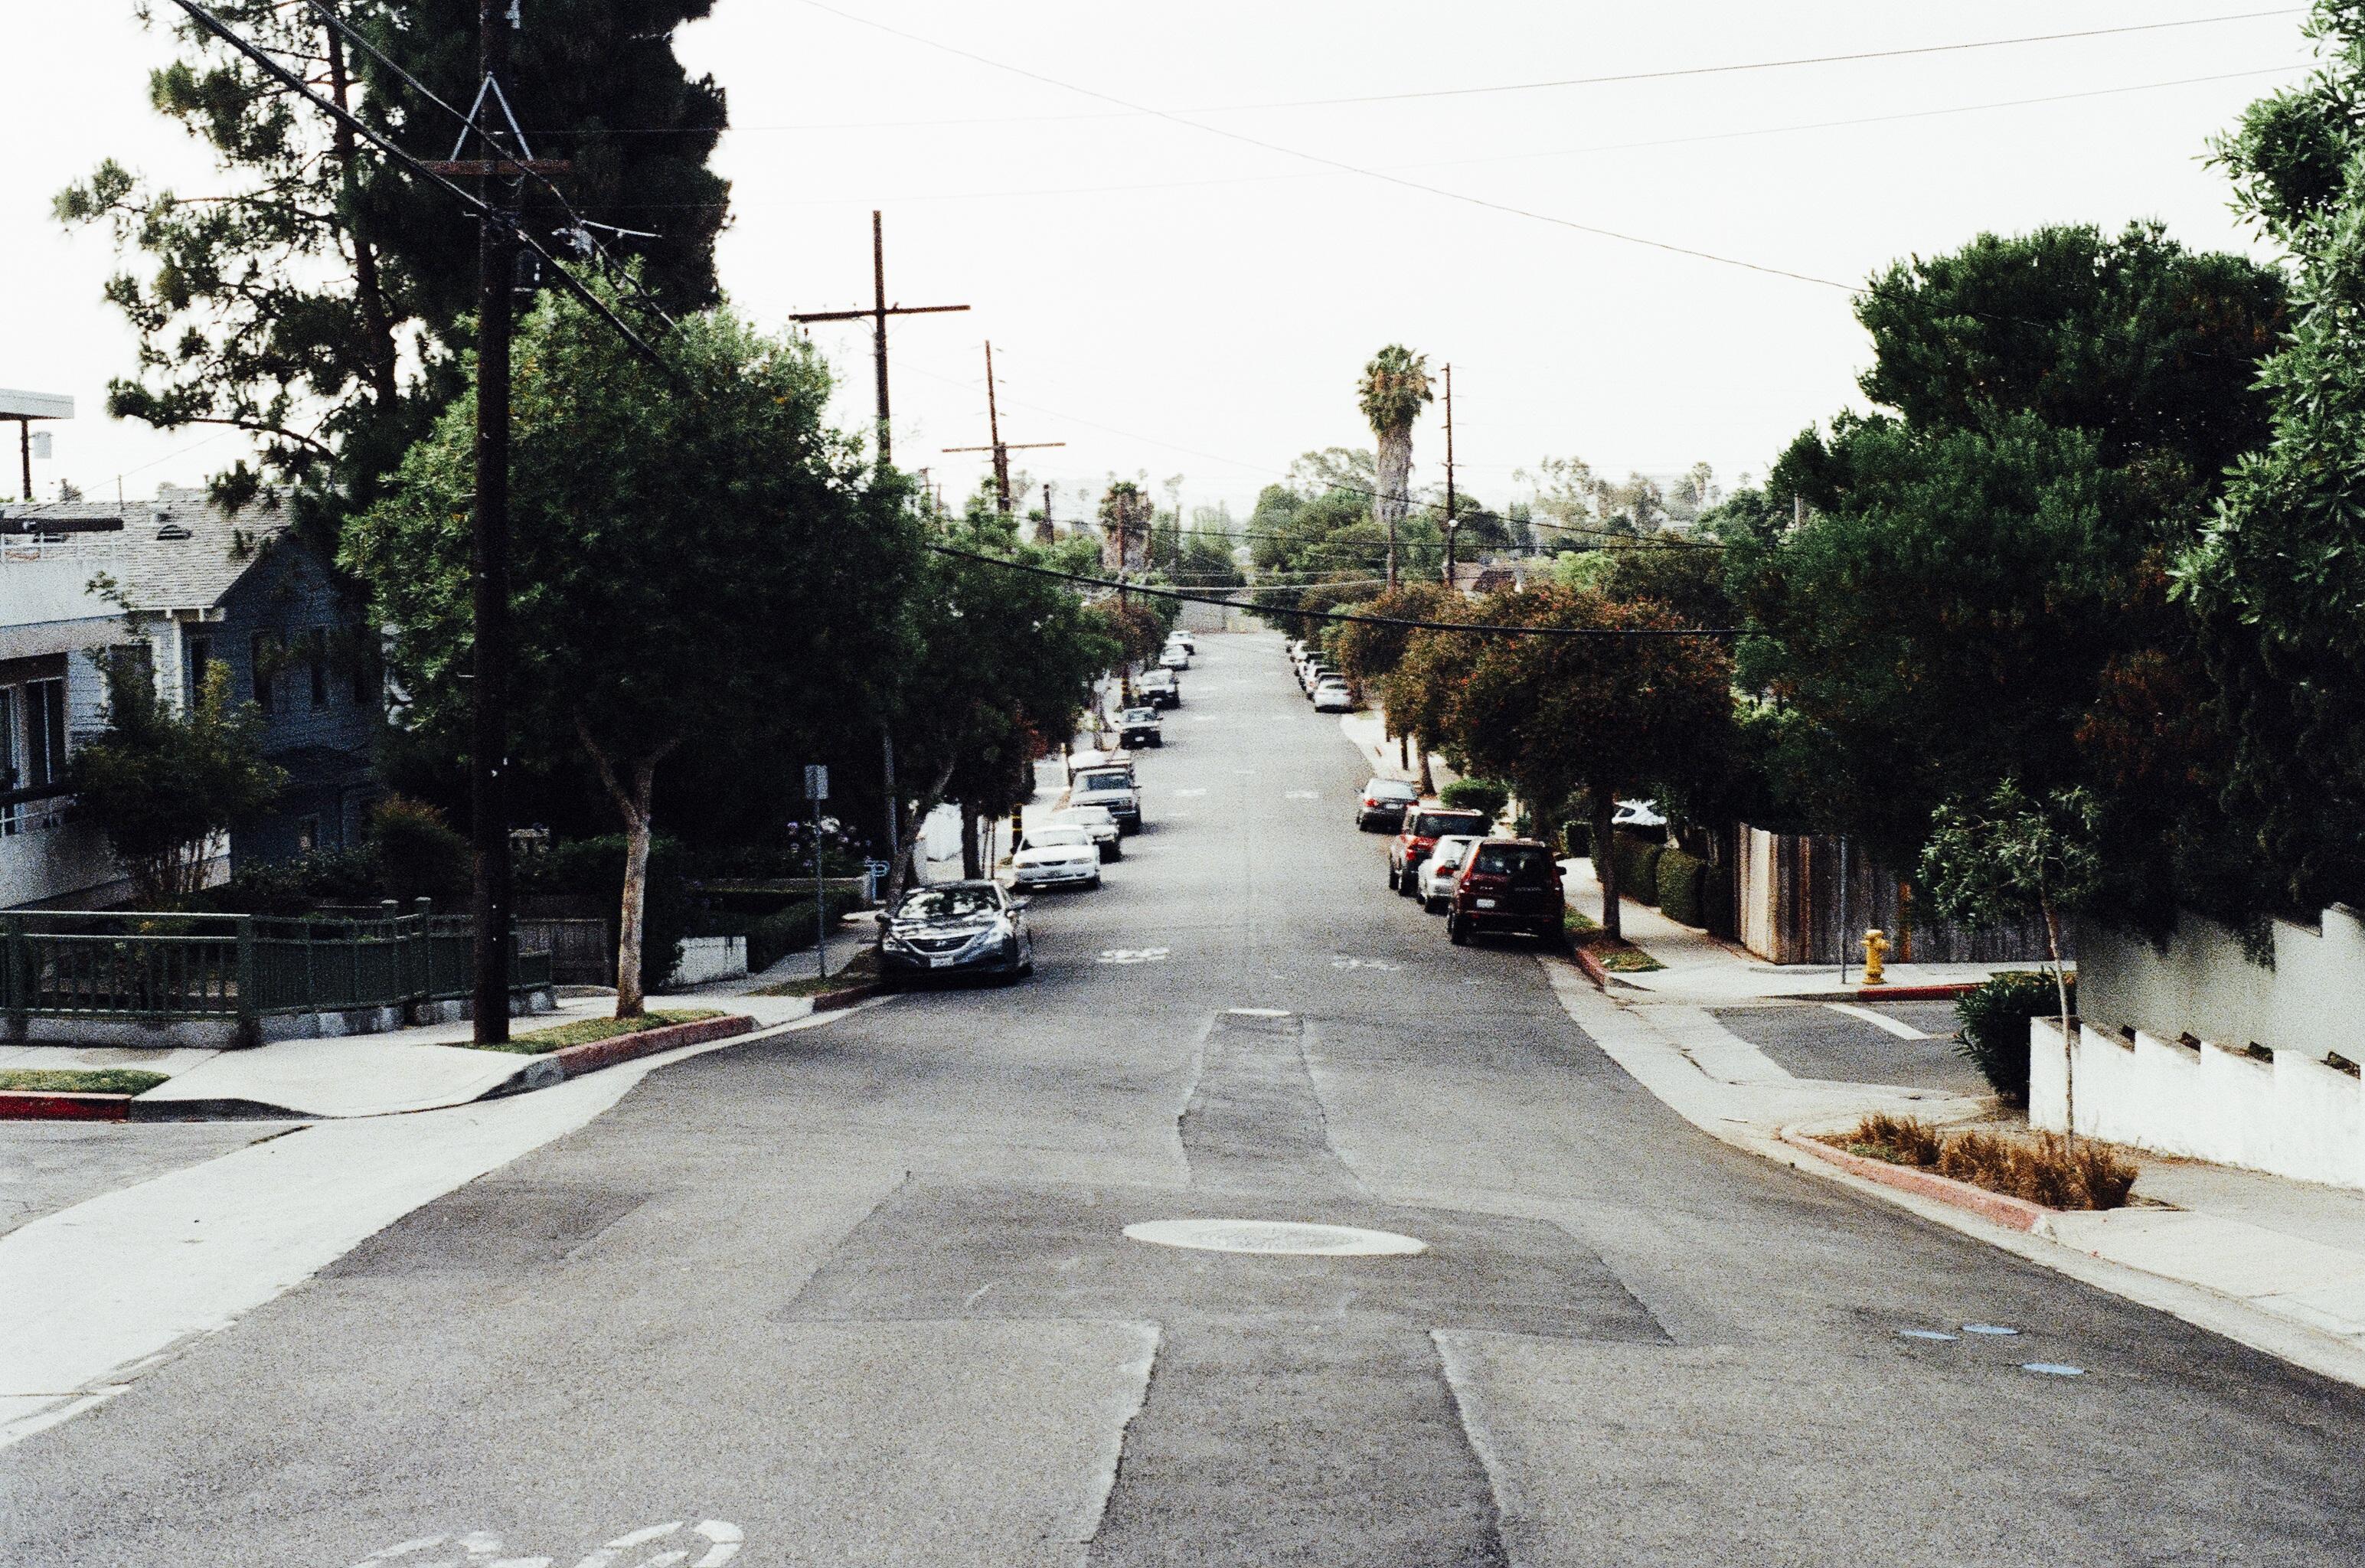 Free Images : street, vintage, sidewalk, old, parking ...